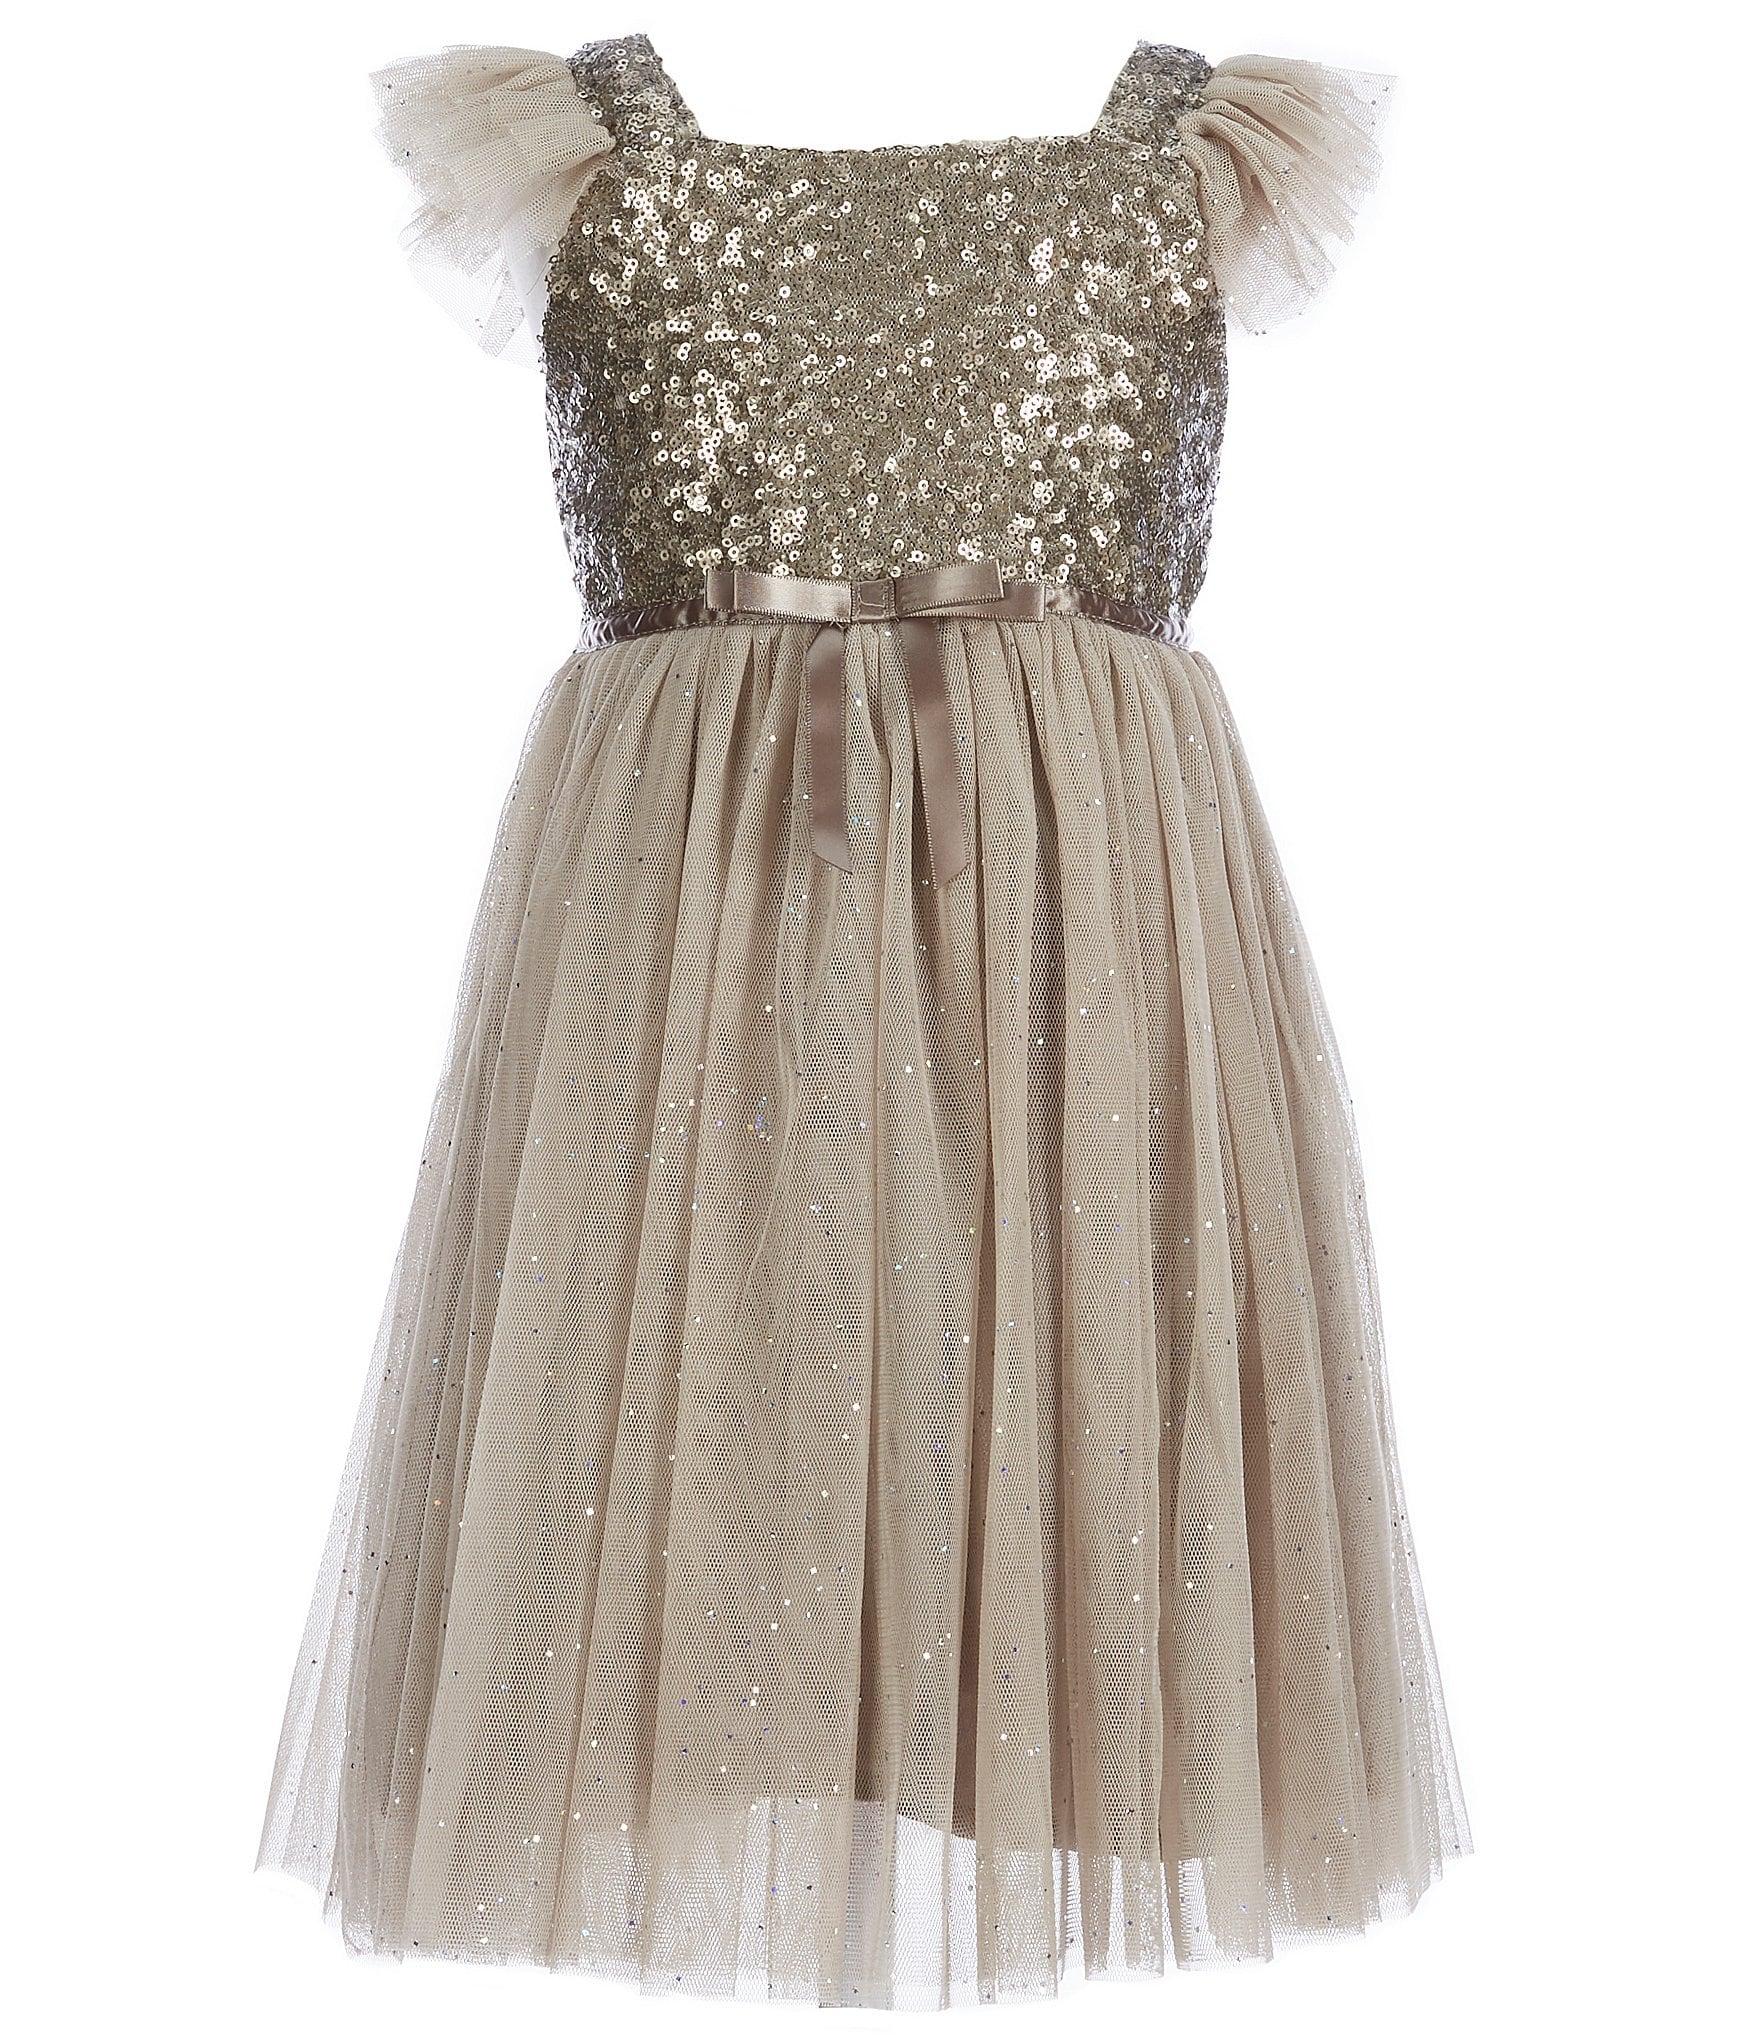 b06c27251 Popatu Little Girls 2-6 Glitter Flutter-Sleeve Tulle Dress | Dillard's